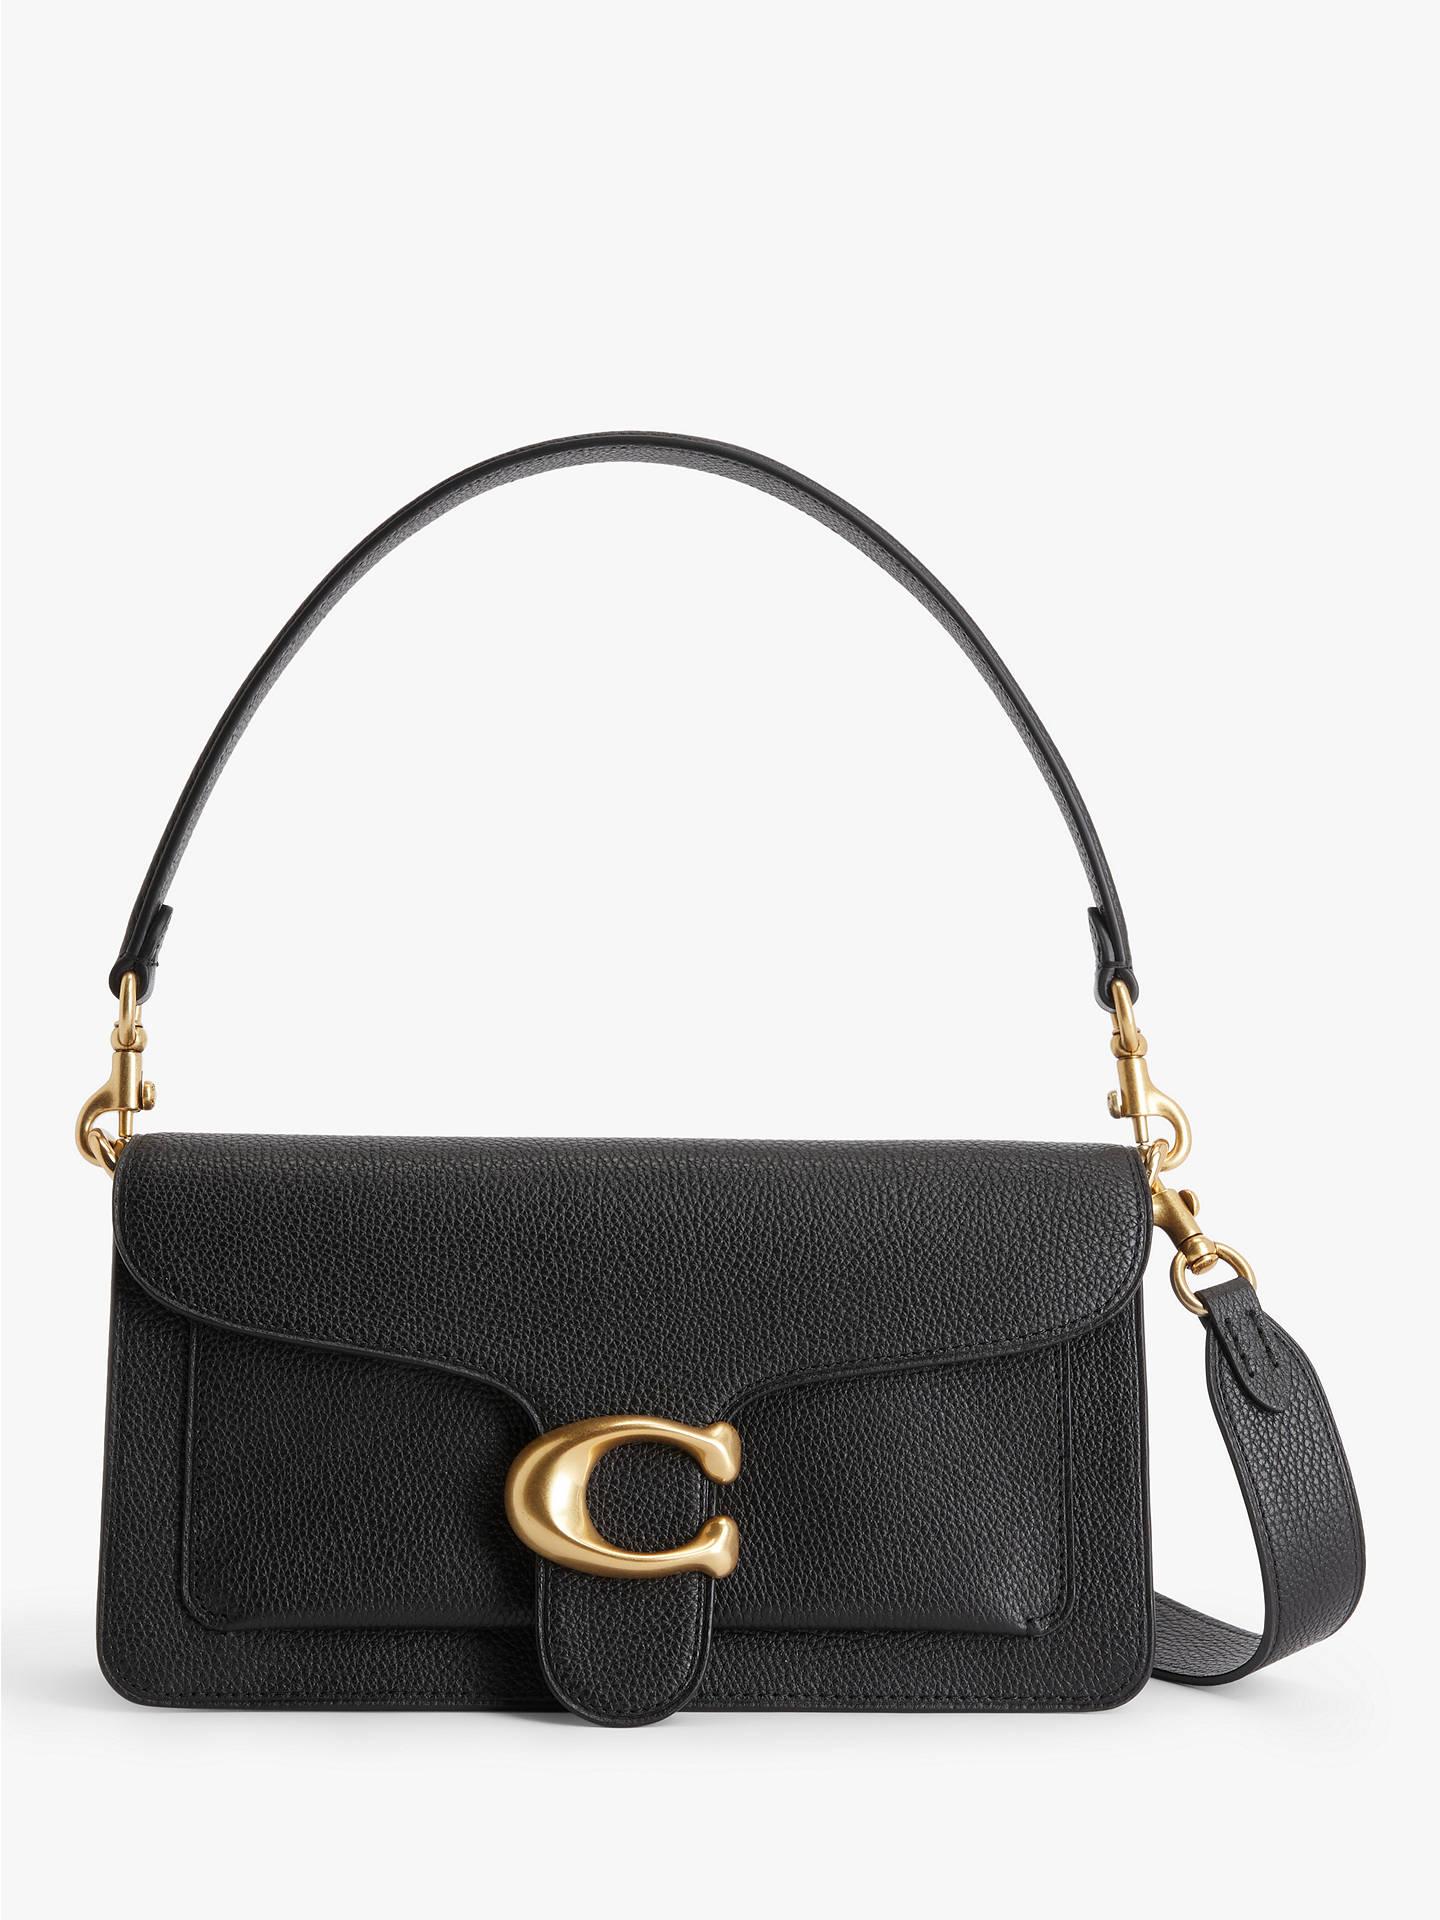 b59aa54d967 Coach Leather Handbags